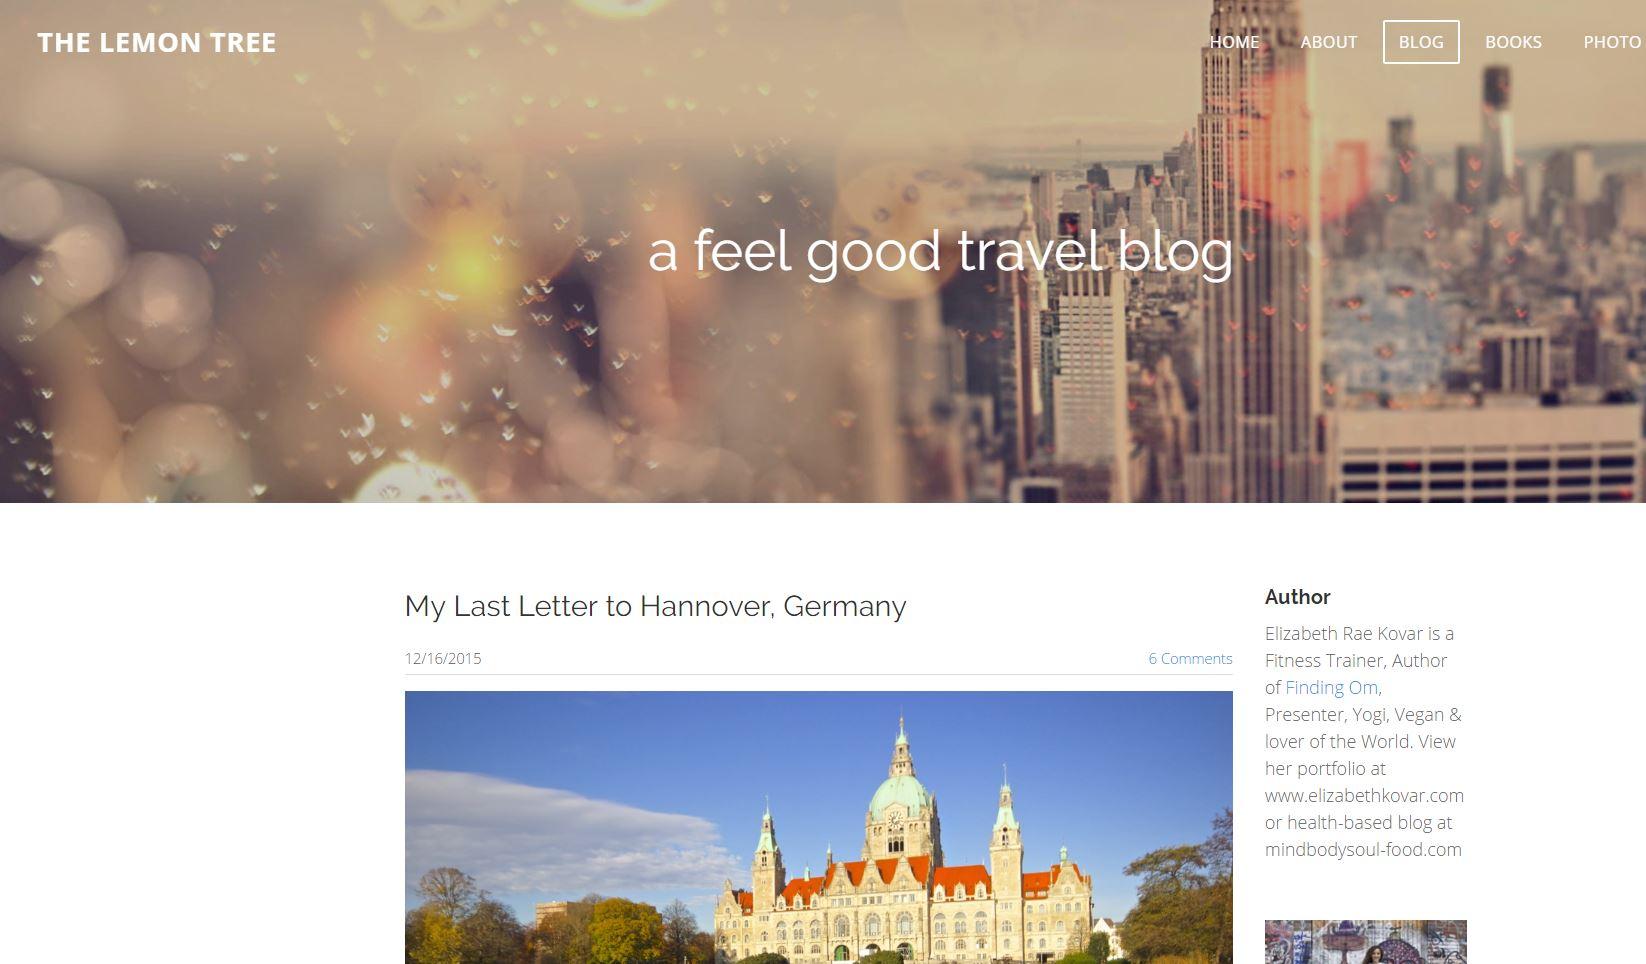 The Lemon Tree Website